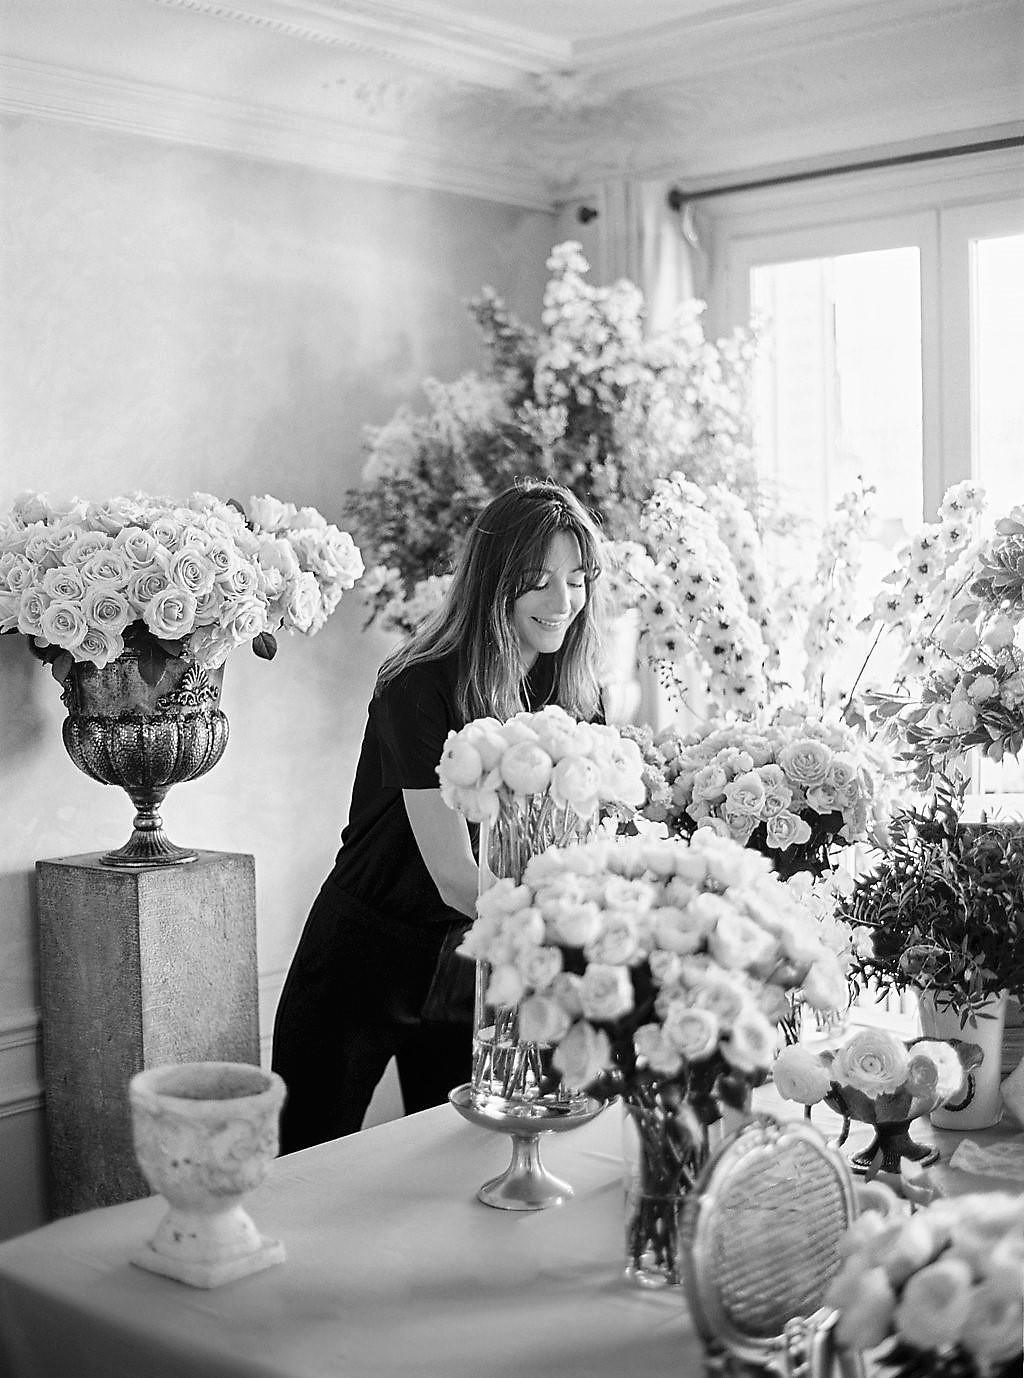 cours_art_floral_luxe_paris_lily_paloma